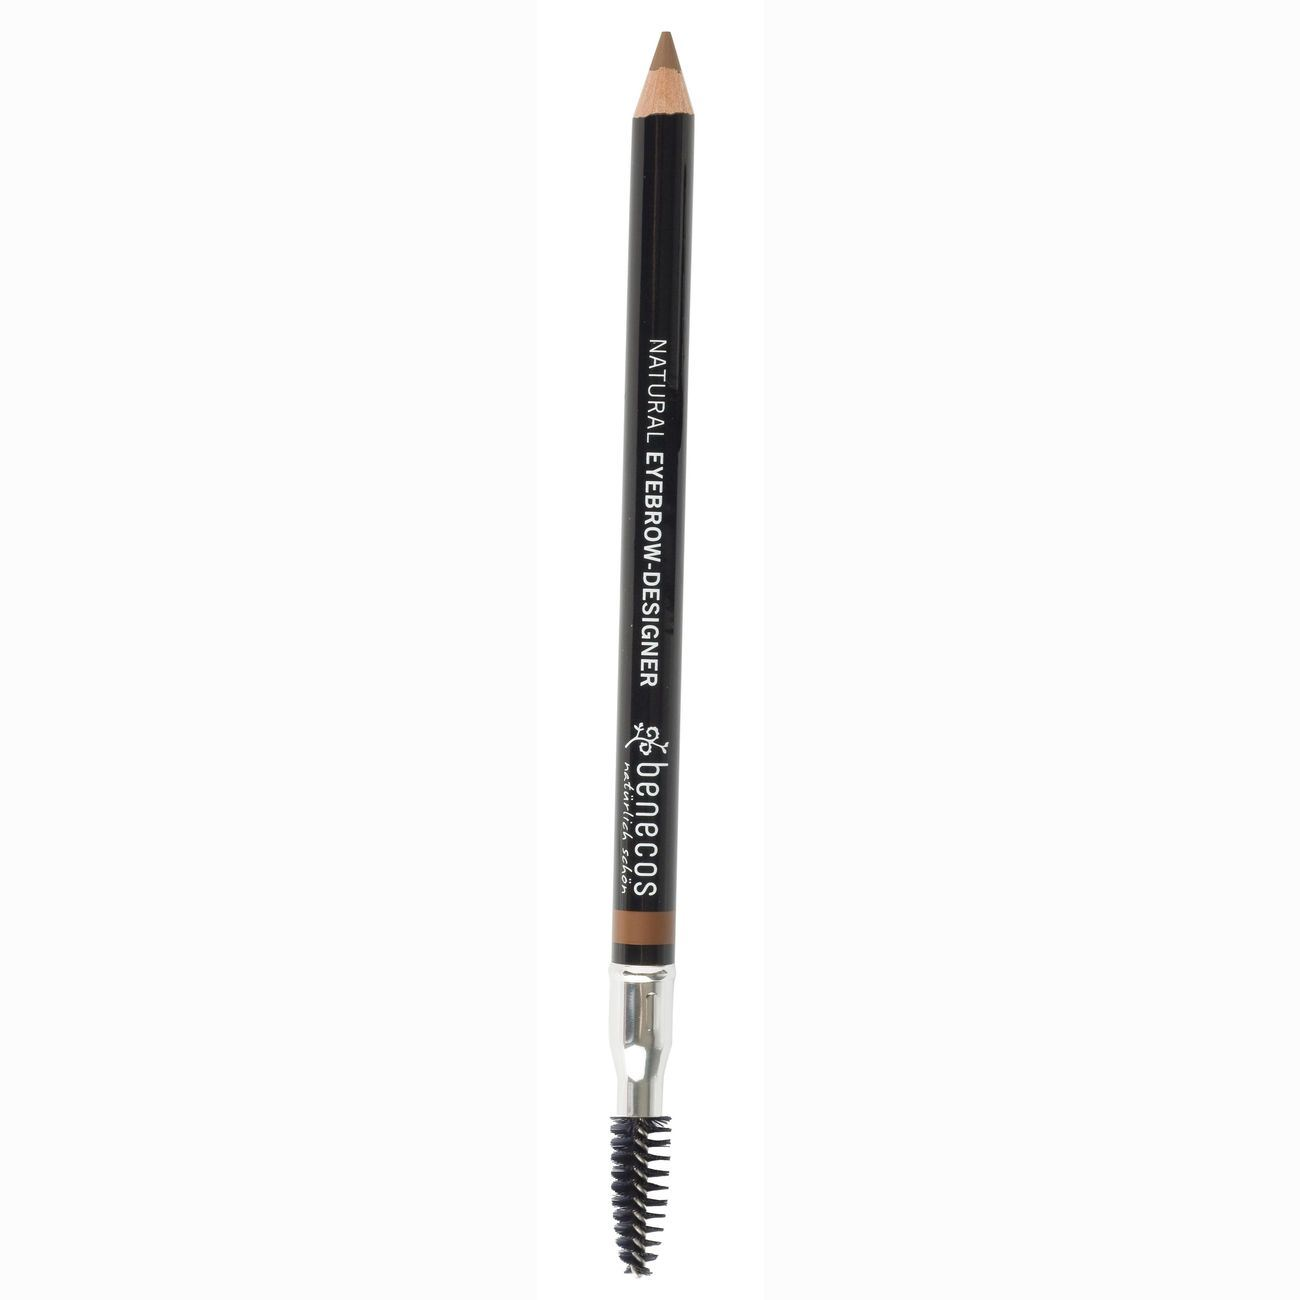 Benecos-Natural-Eyebrow-Designer-Pencil-with-Brush-1-05g